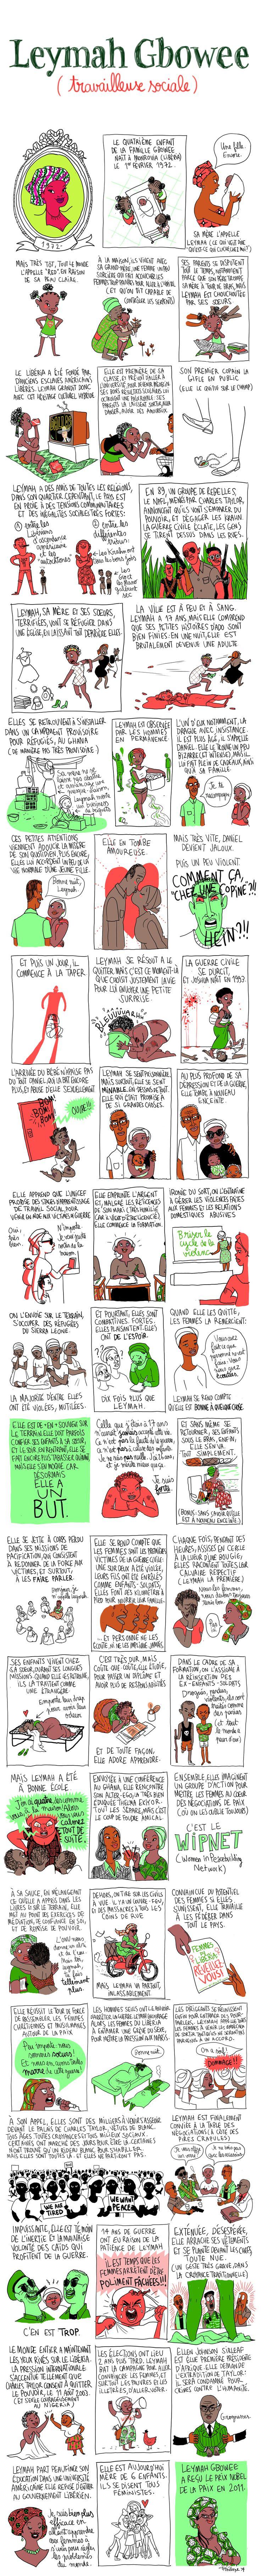 Leymah Gbowee, travailleuse sociale Les Culottées, Pénélope Bagieu